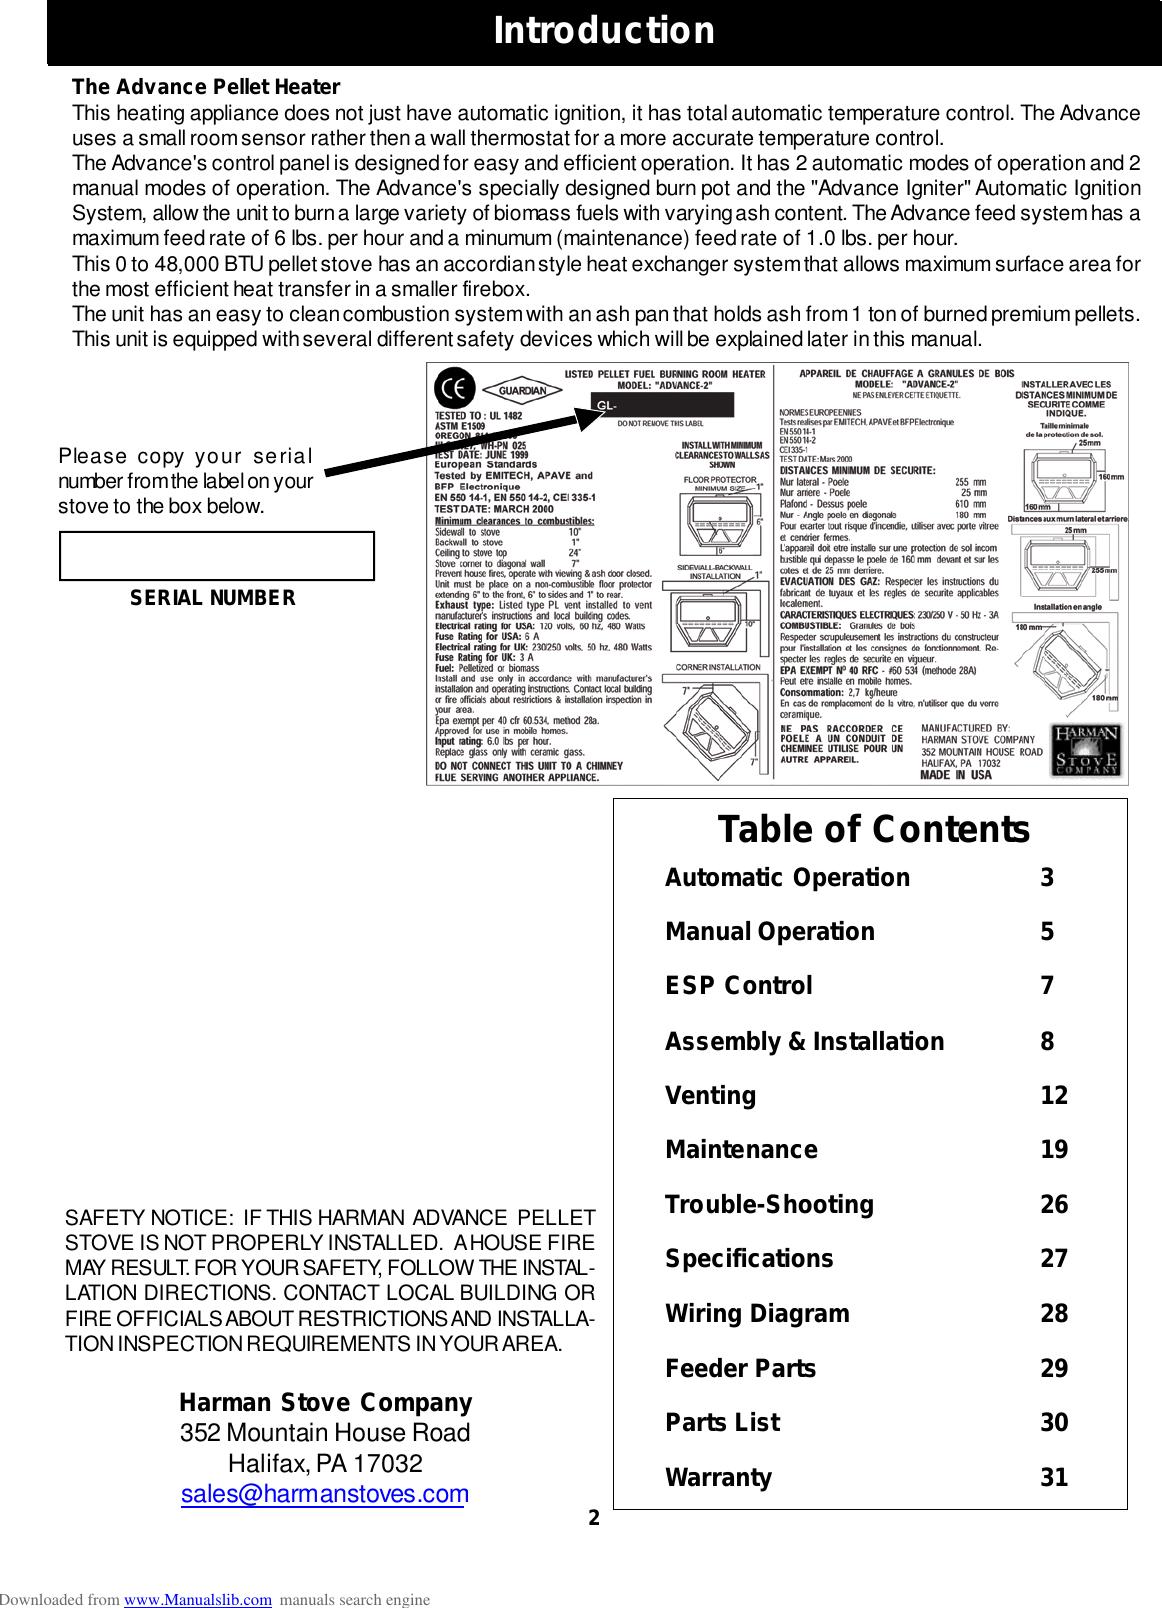 Harman Advance Pellet Stove Instruction Manual ManualsLib ... on